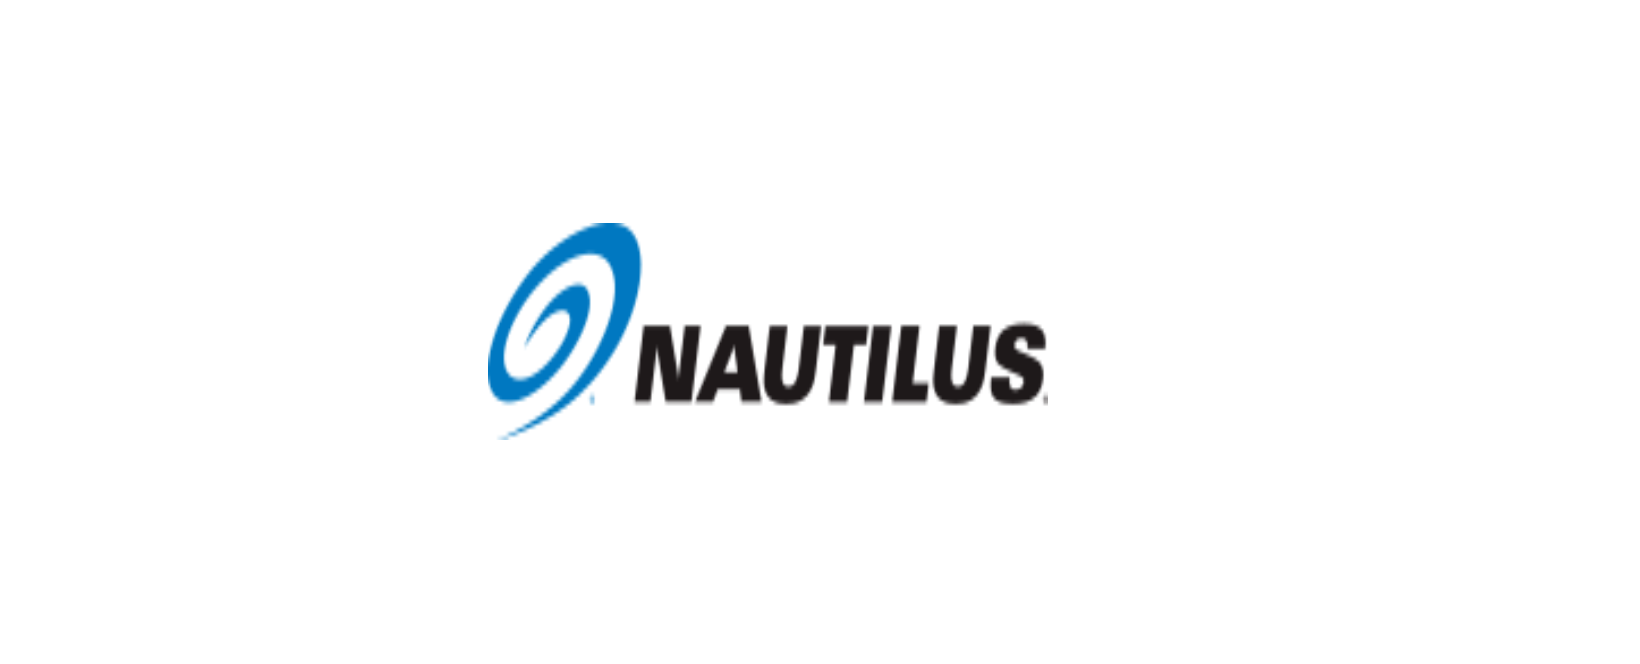 Nautilus & Schwinn Discount Code 2021